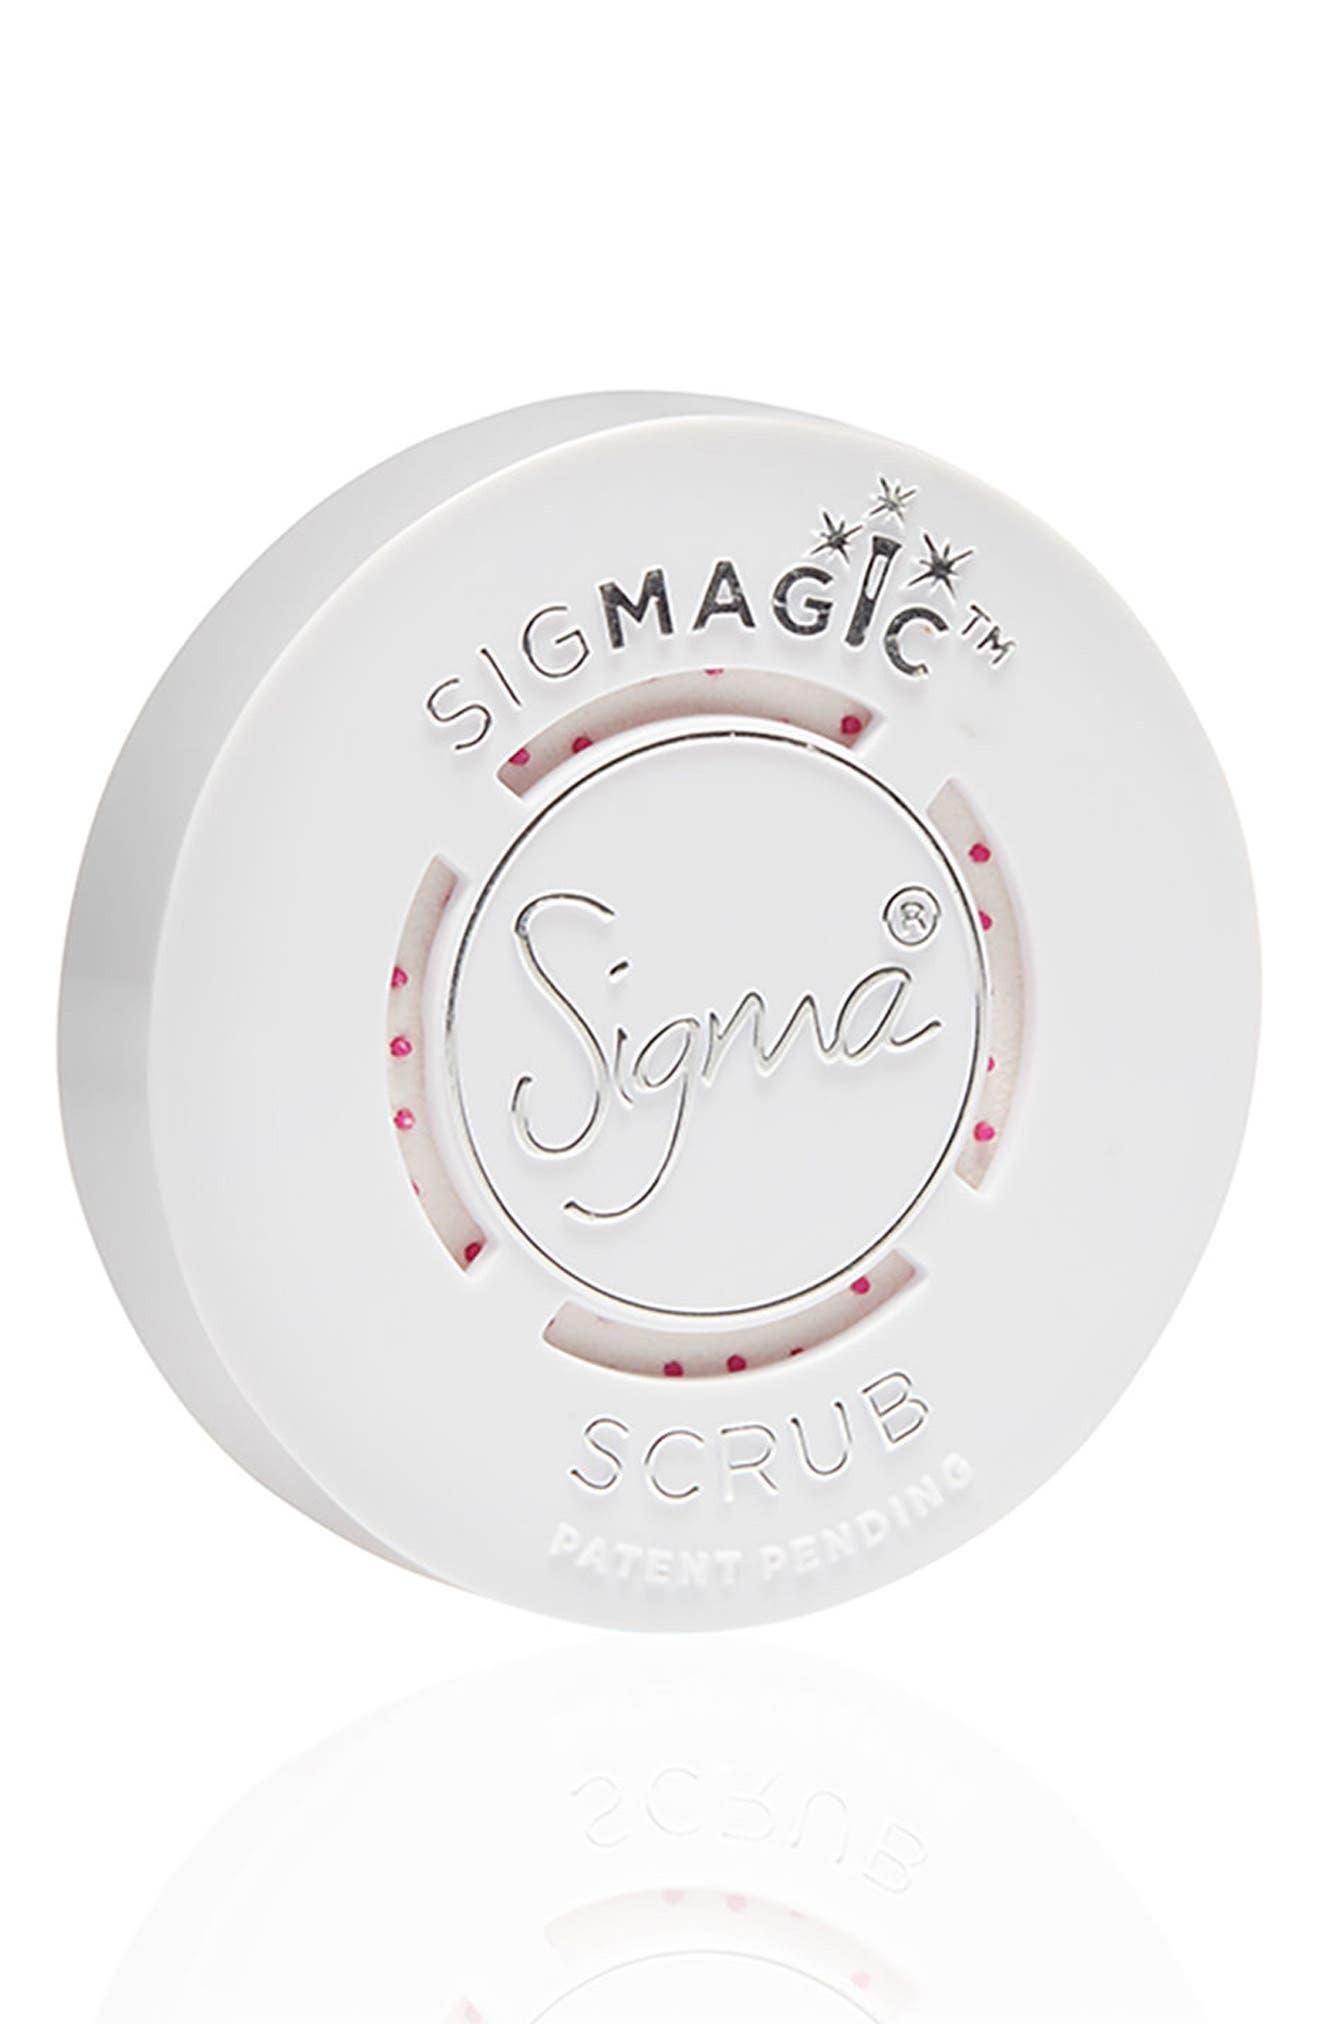 SigMagic<sup>®</sup> Scrub,                         Main,                         color, No Color